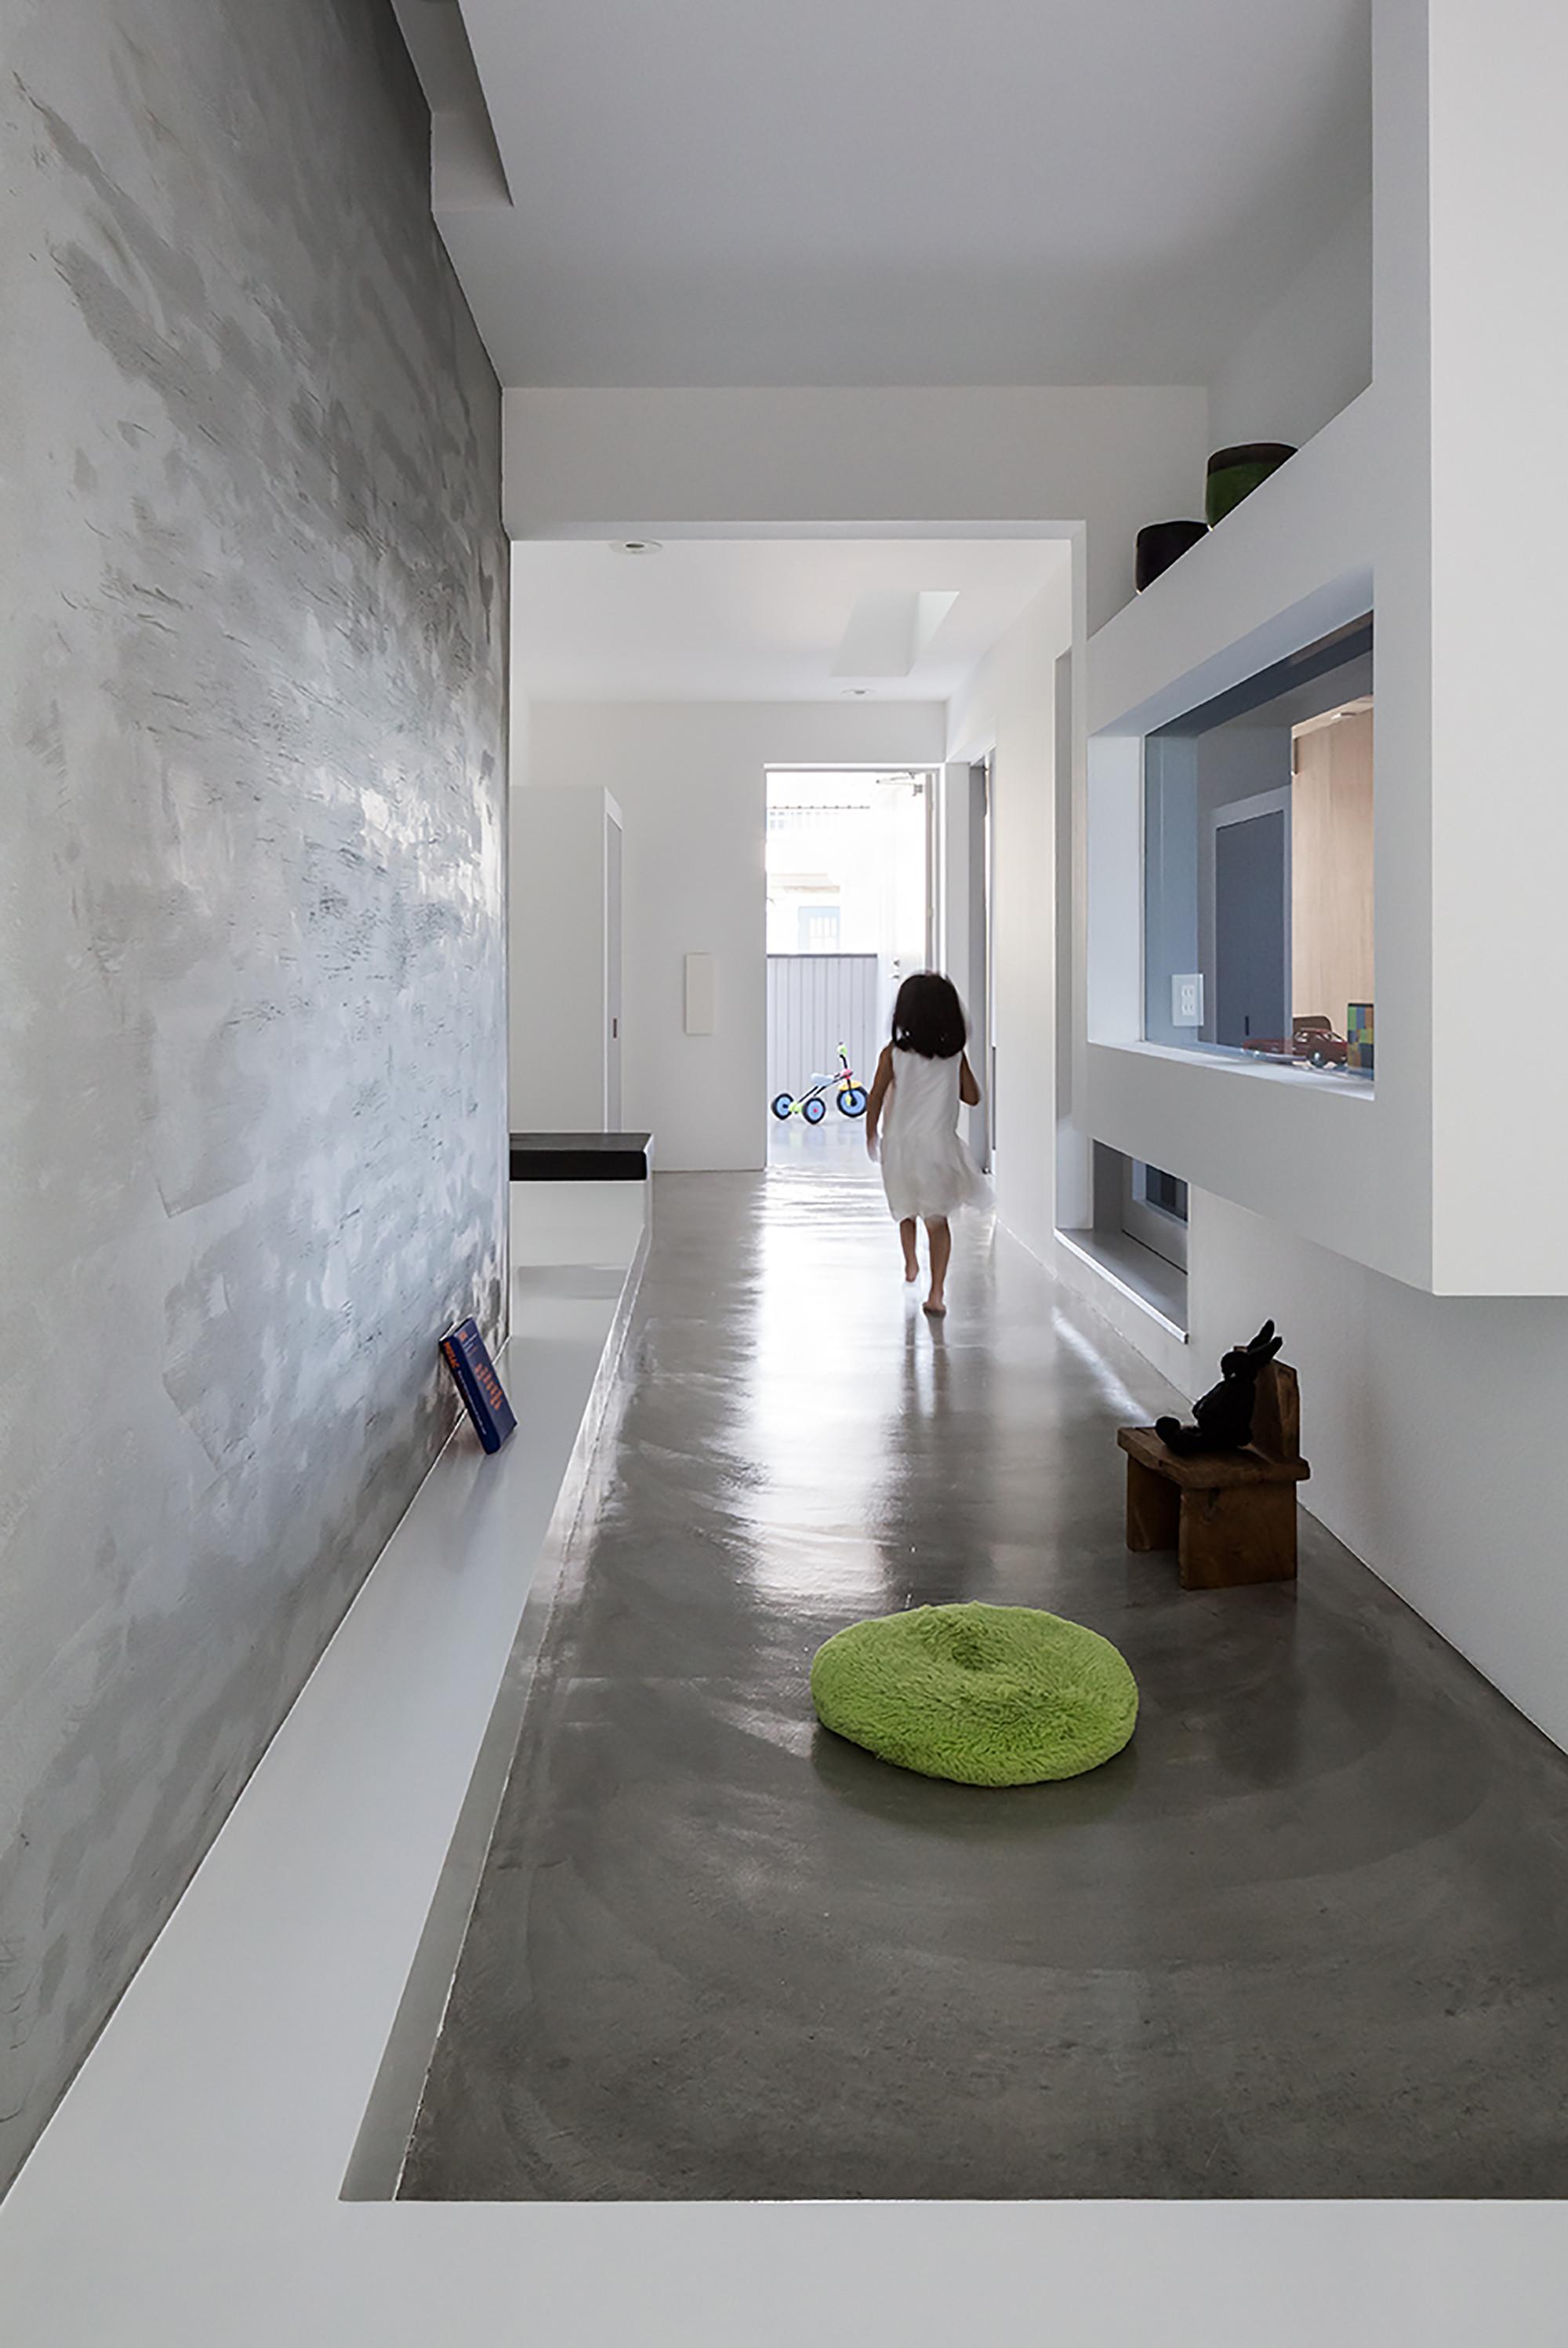 Scape House by FORM - Kouichi Kimura Architects in Shiga ...